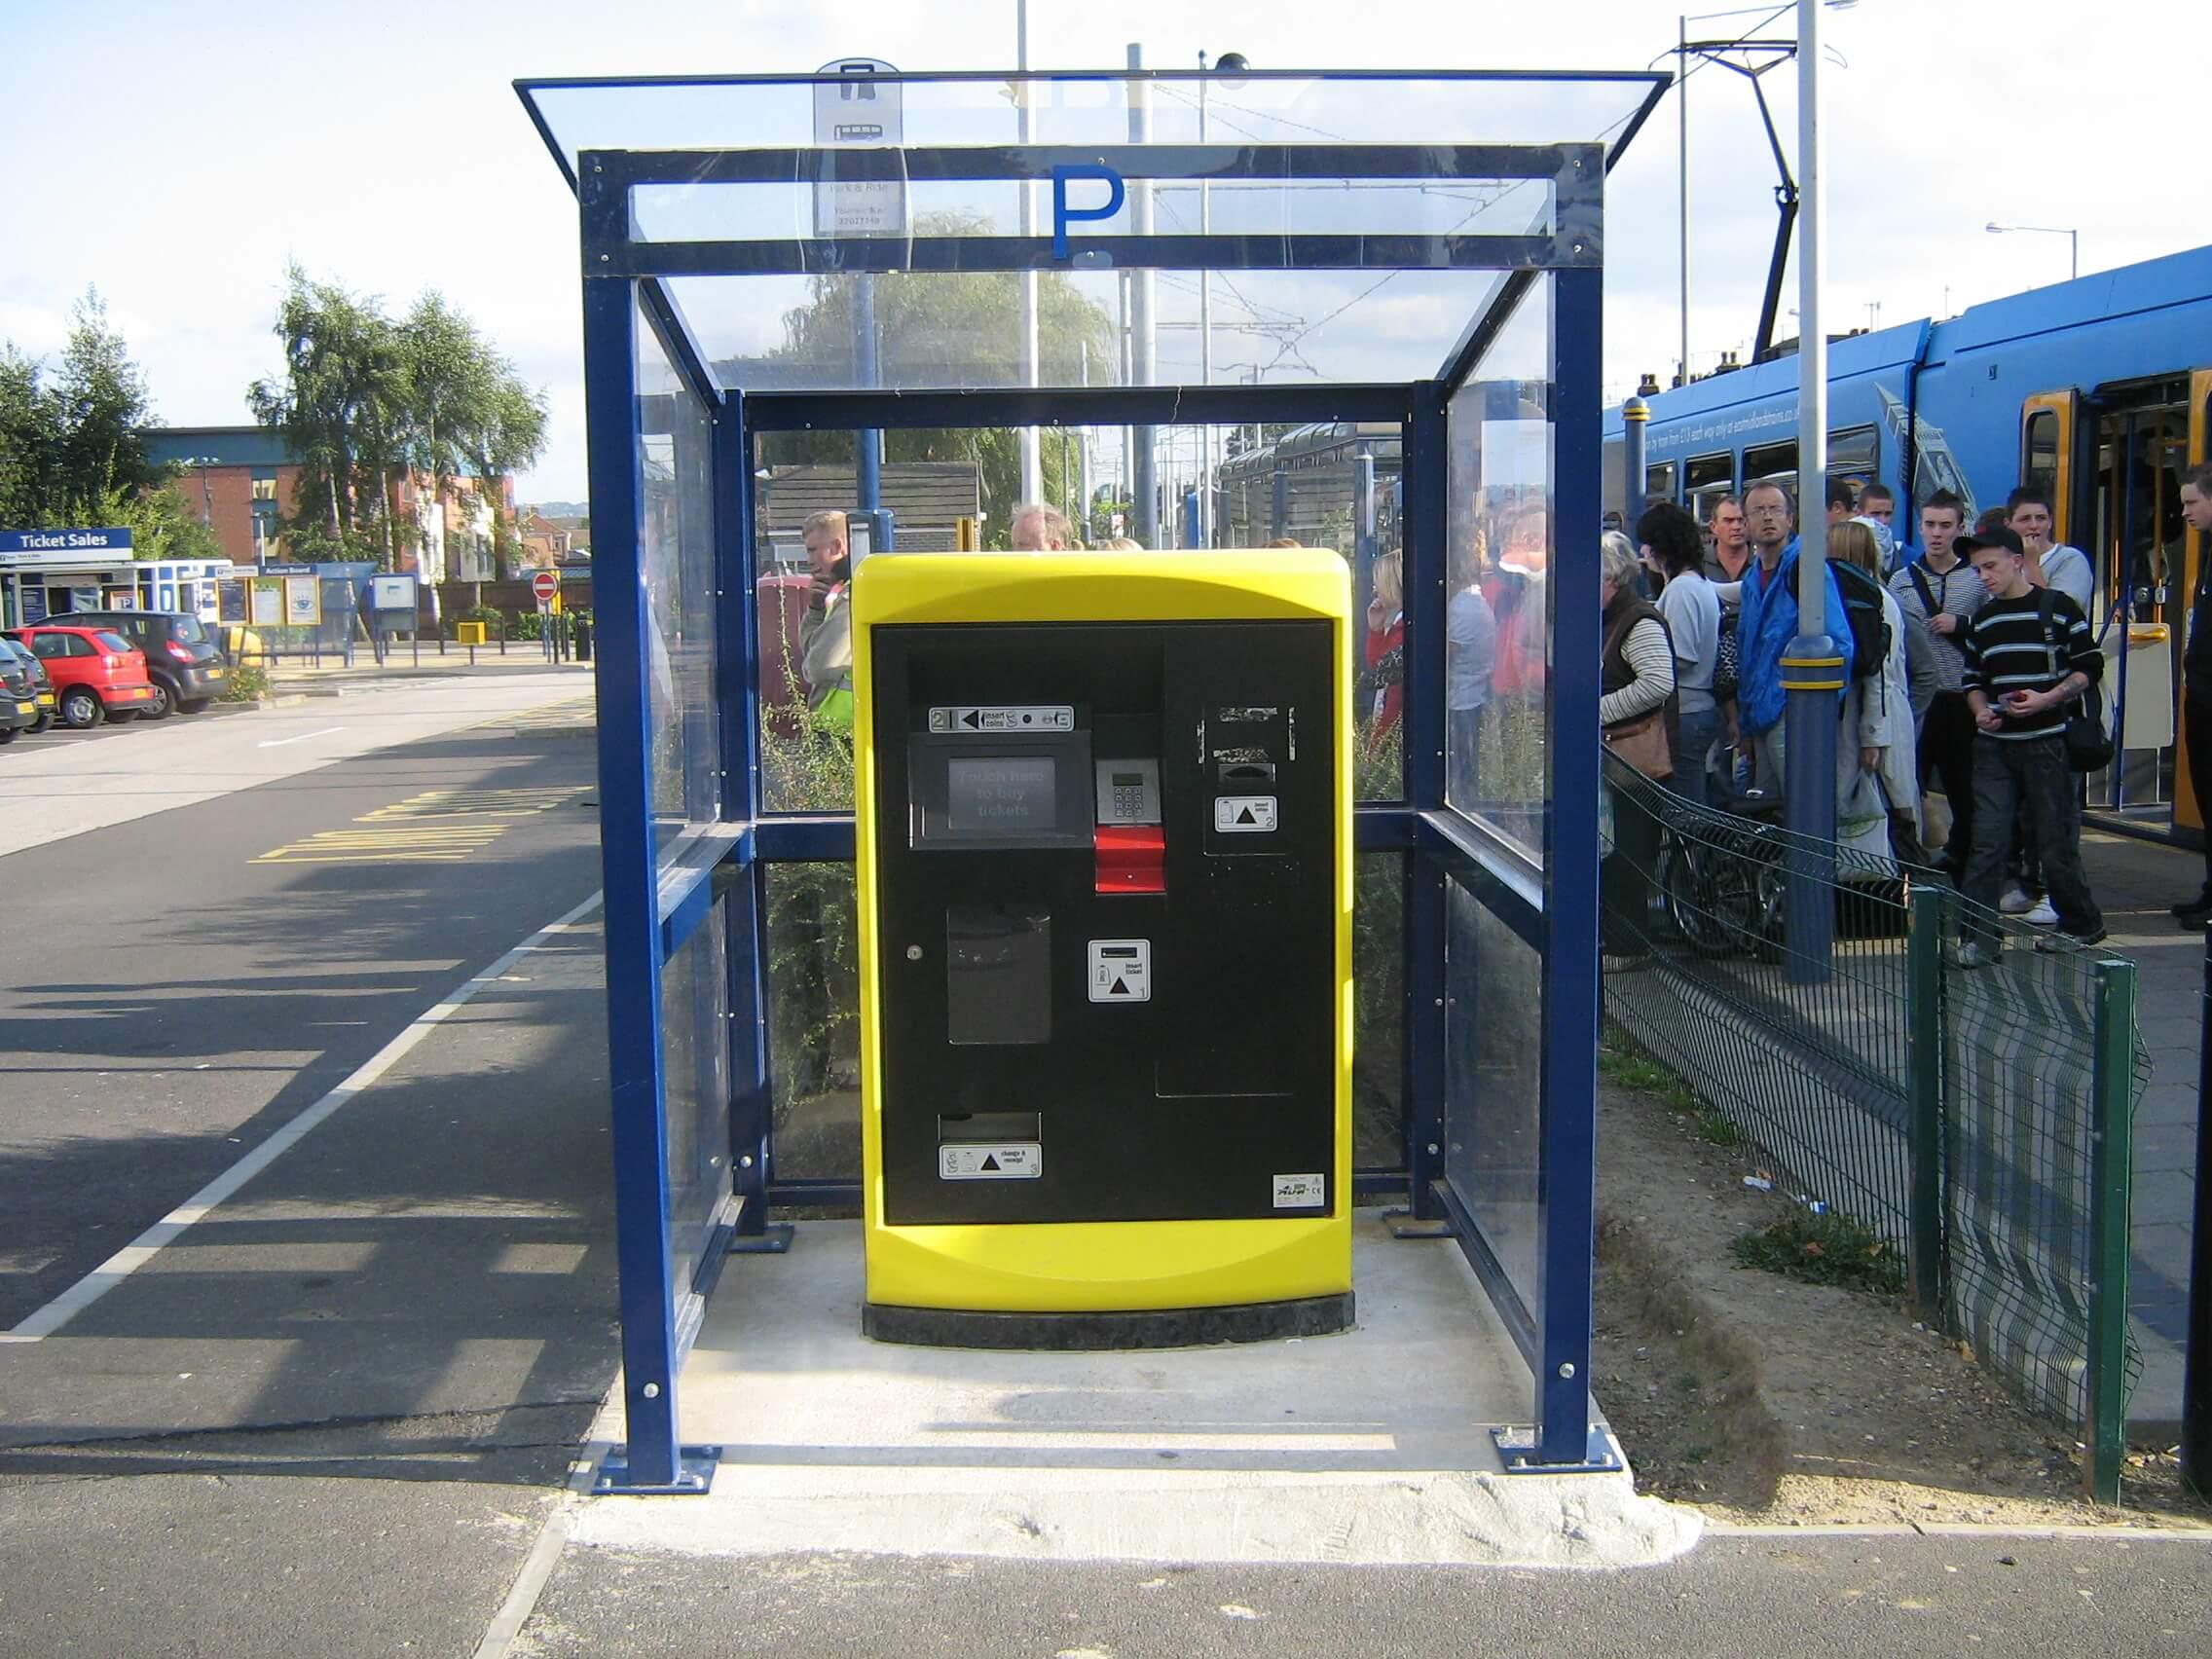 Mono Pitch Ticket Machine Shelter